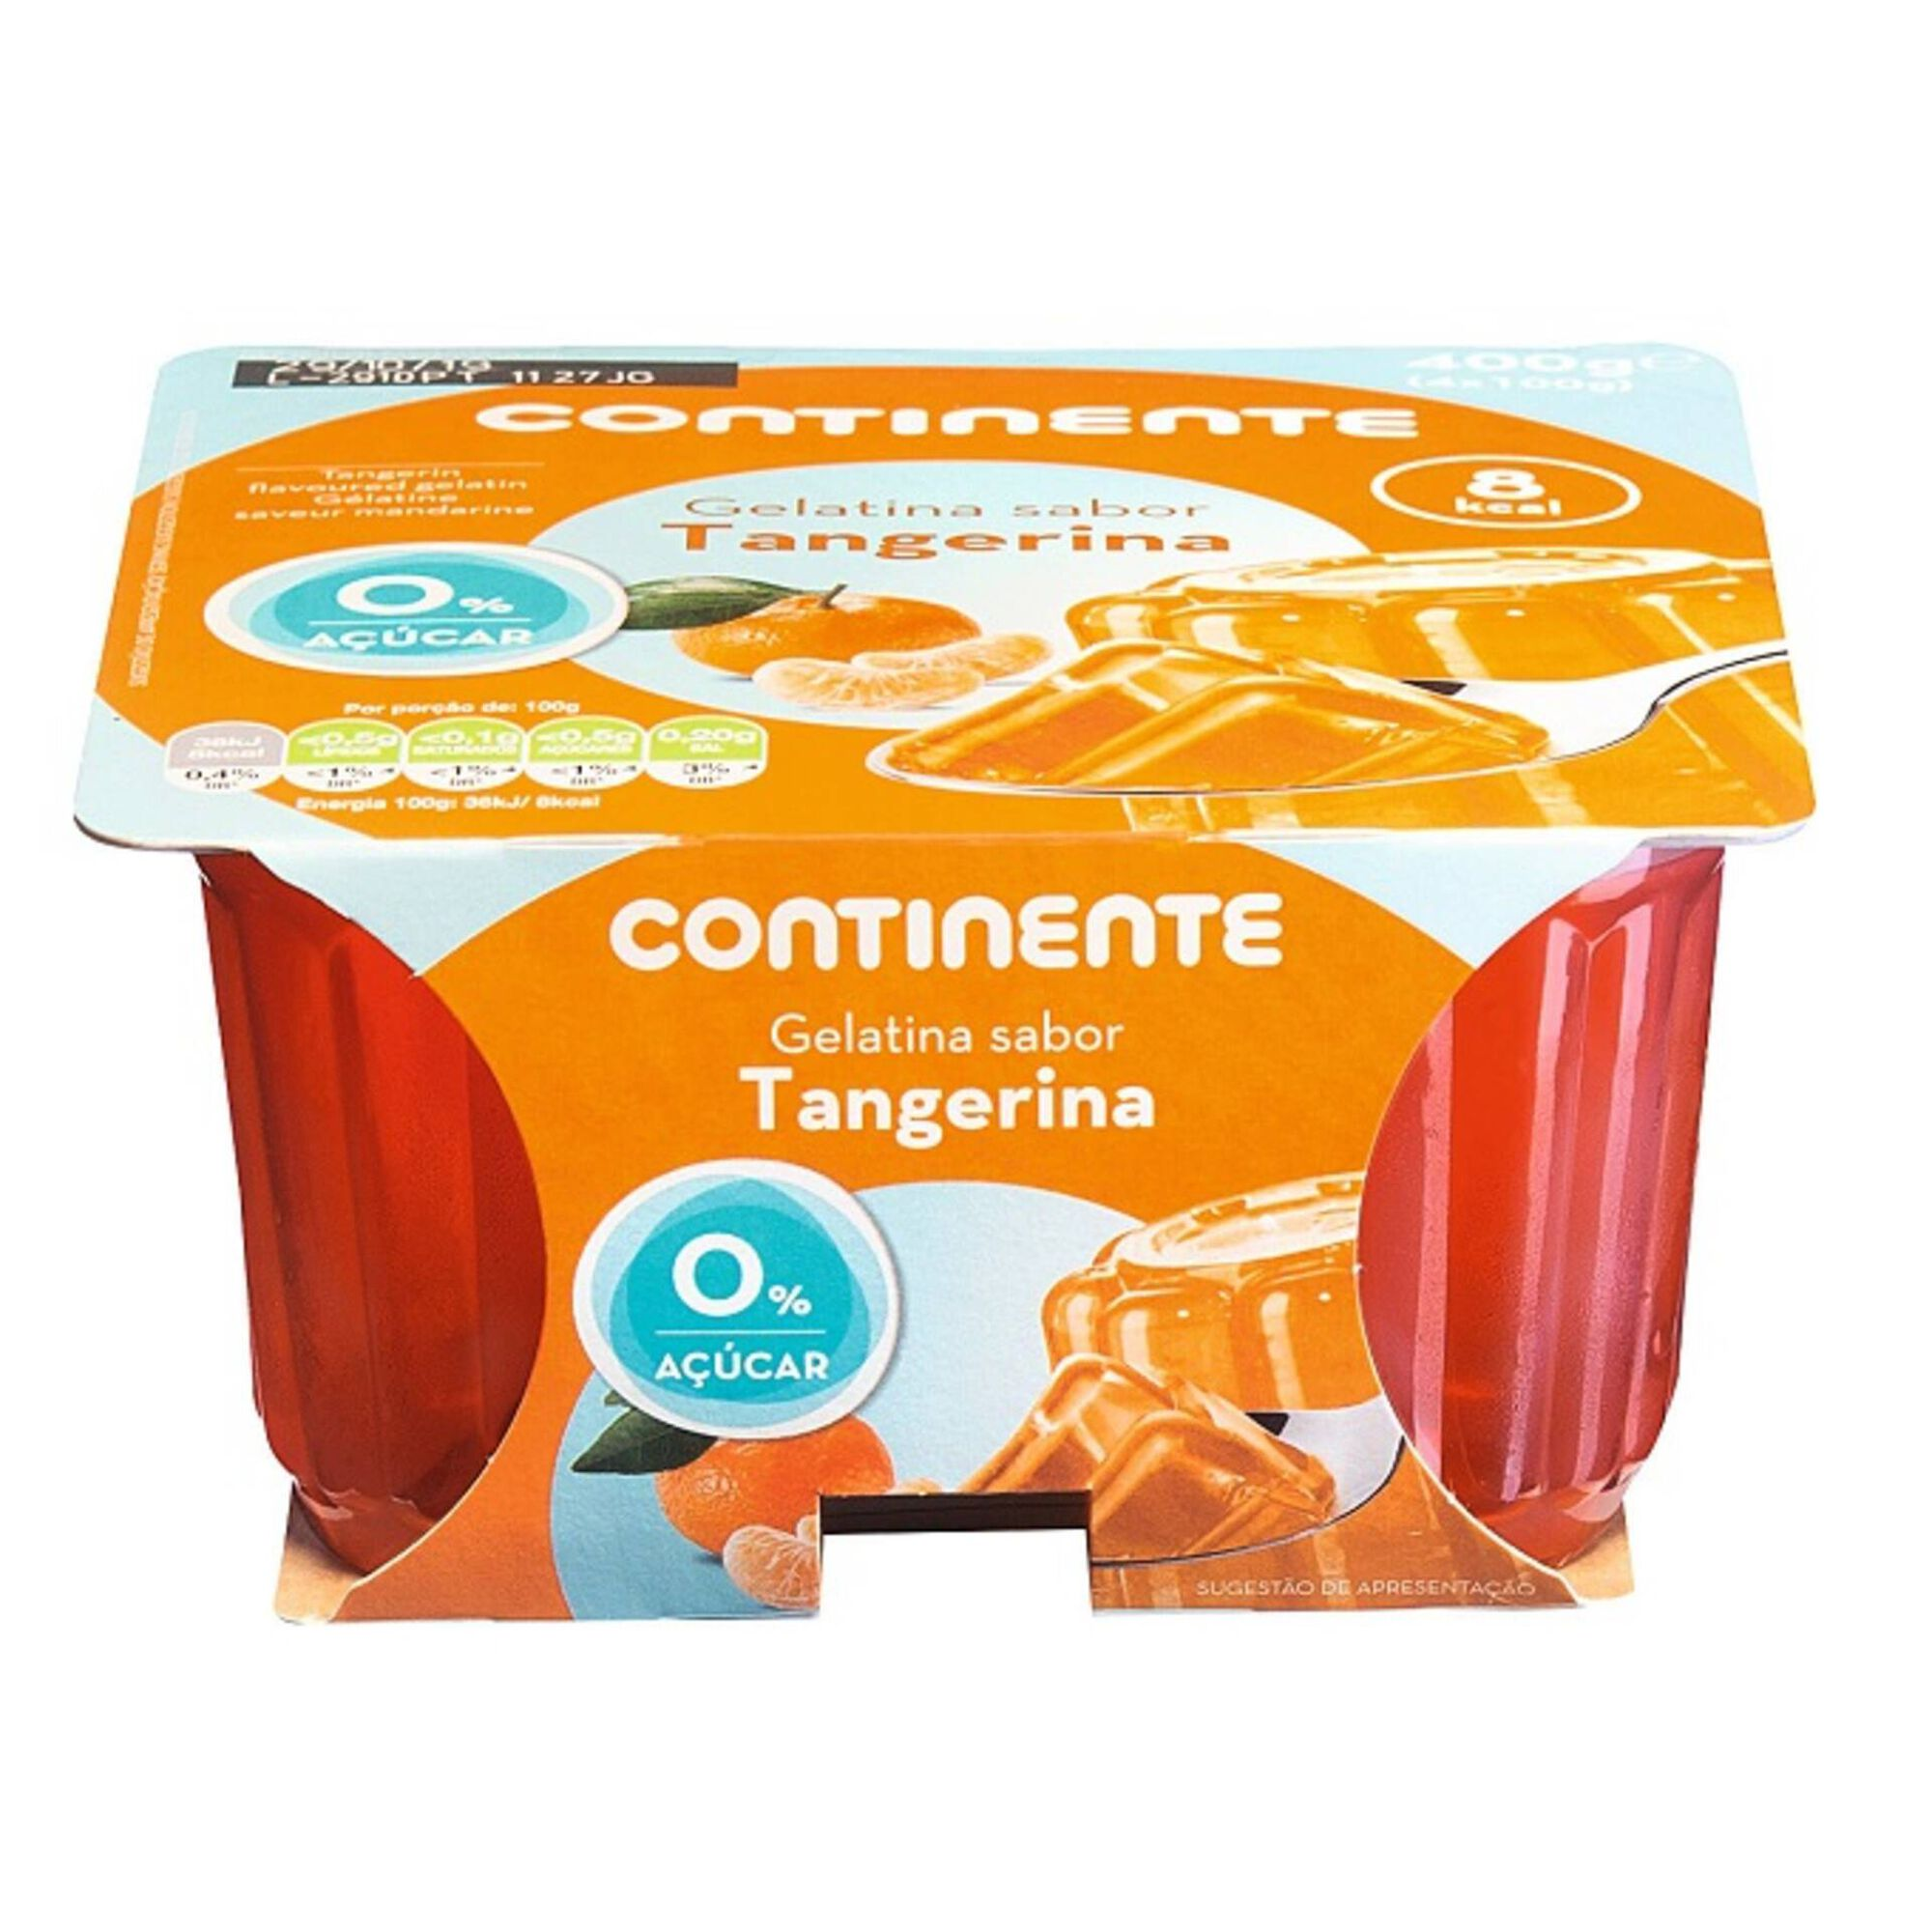 Gelatina Pronta Tangerina sem Açúcar, , hi-res